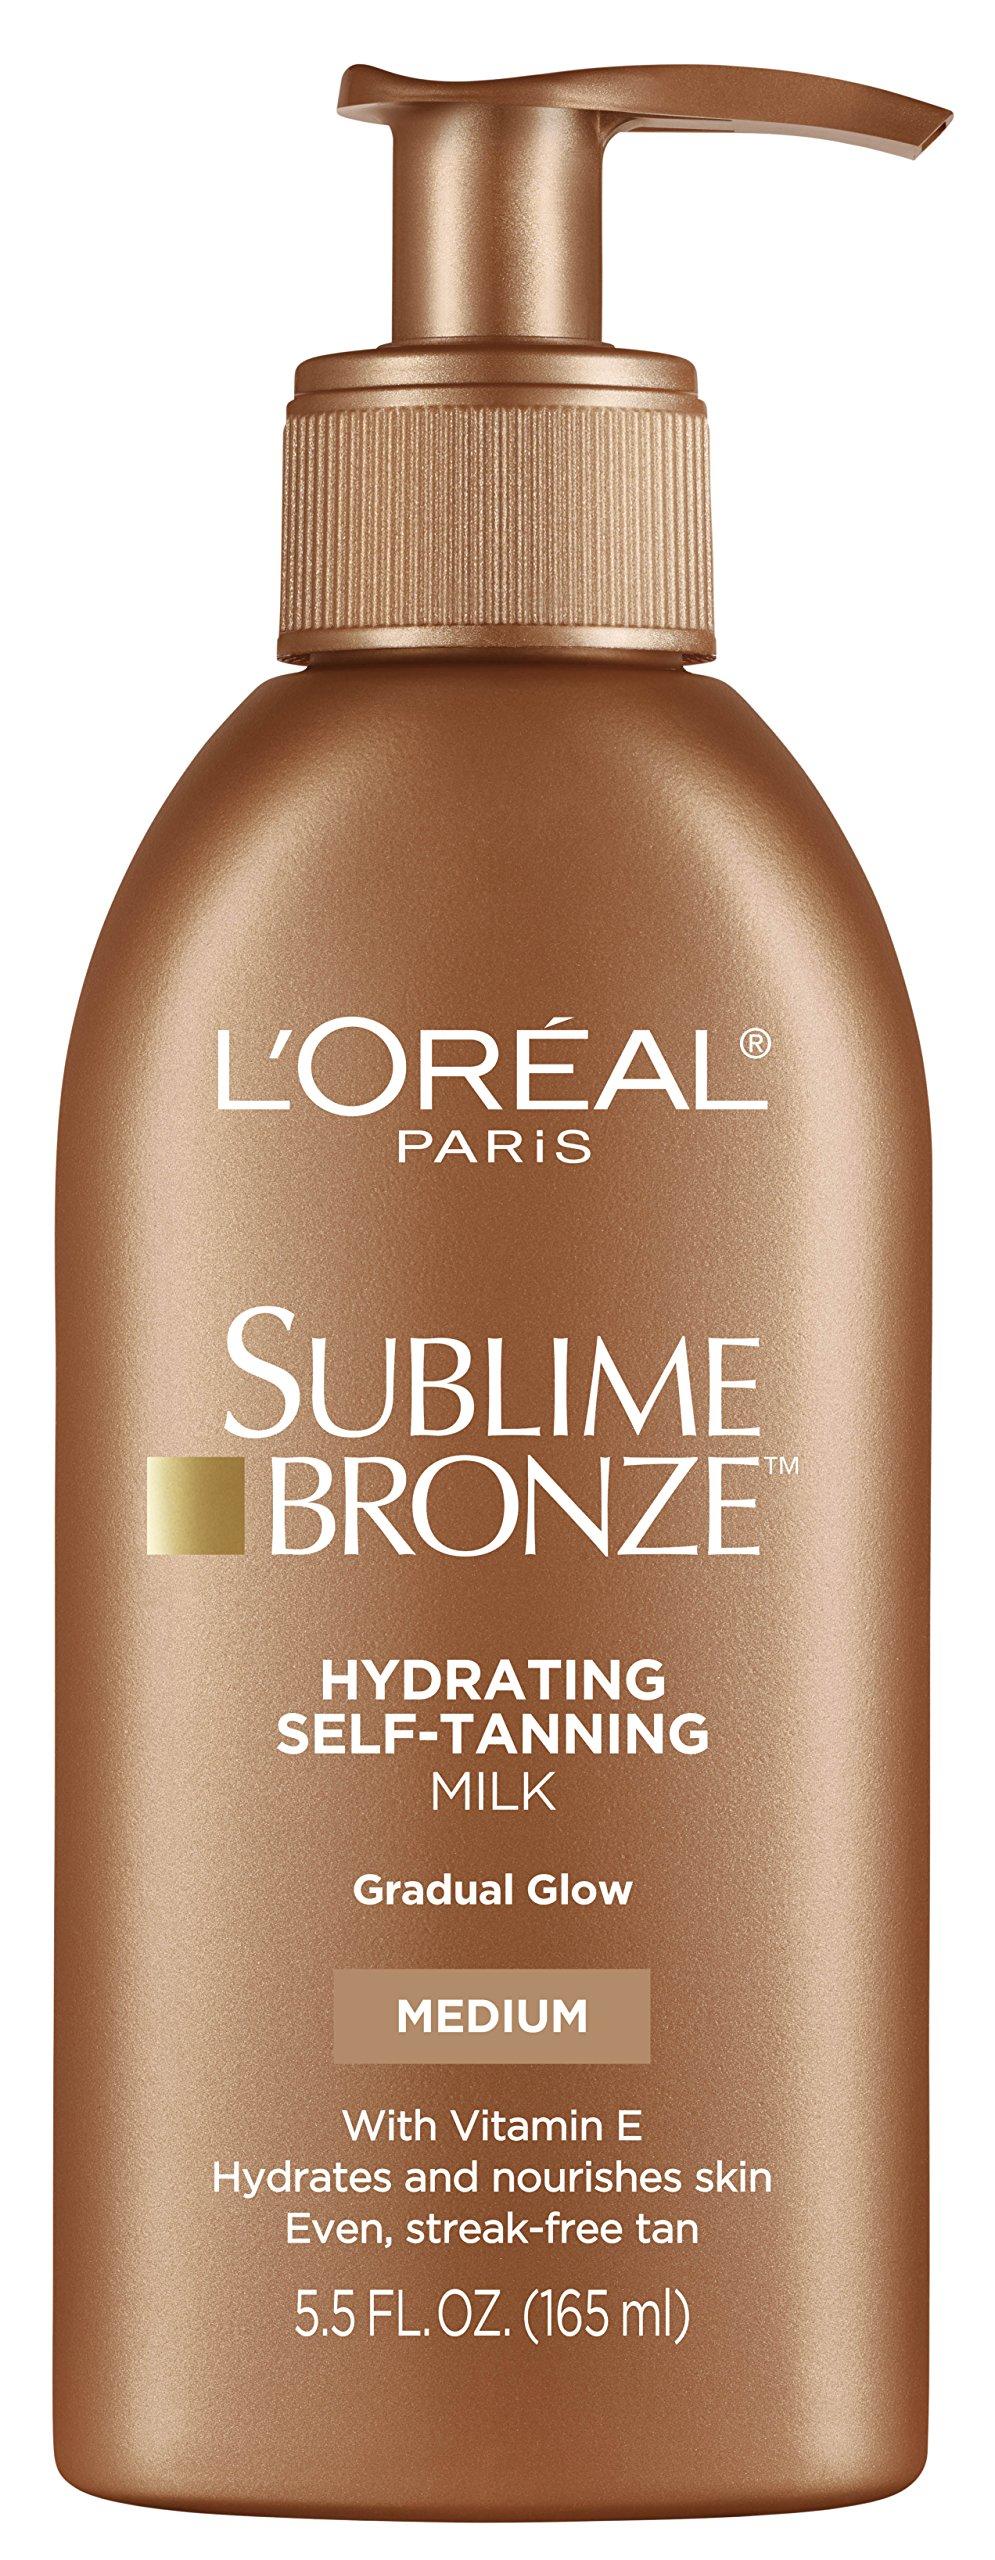 L'Oréal Paris Sublime Bronze Hydrating Self-Tanning Milk, Medium, 5.5 fl. oz.